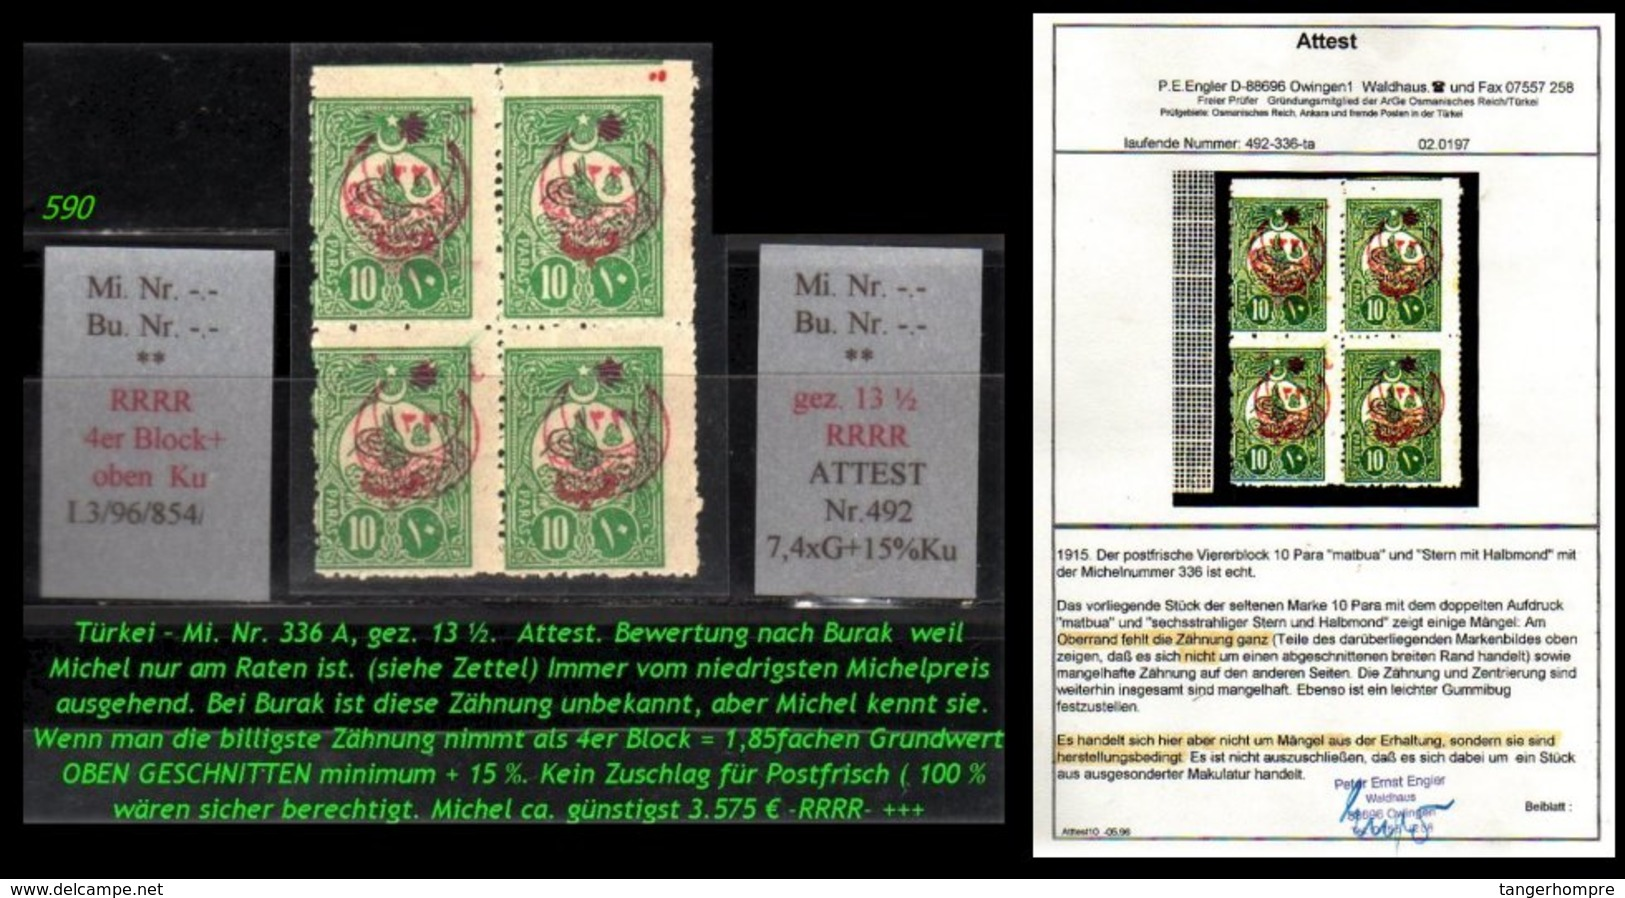 TURKEY ,EARLY OTTOMAN SPECIALIZED FOR SPECIALIST, SEE...Mi. Nr. 336 A - 4er Block Oben U !!! -RRR- Attest - - 1858-1921 Ottoman Empire